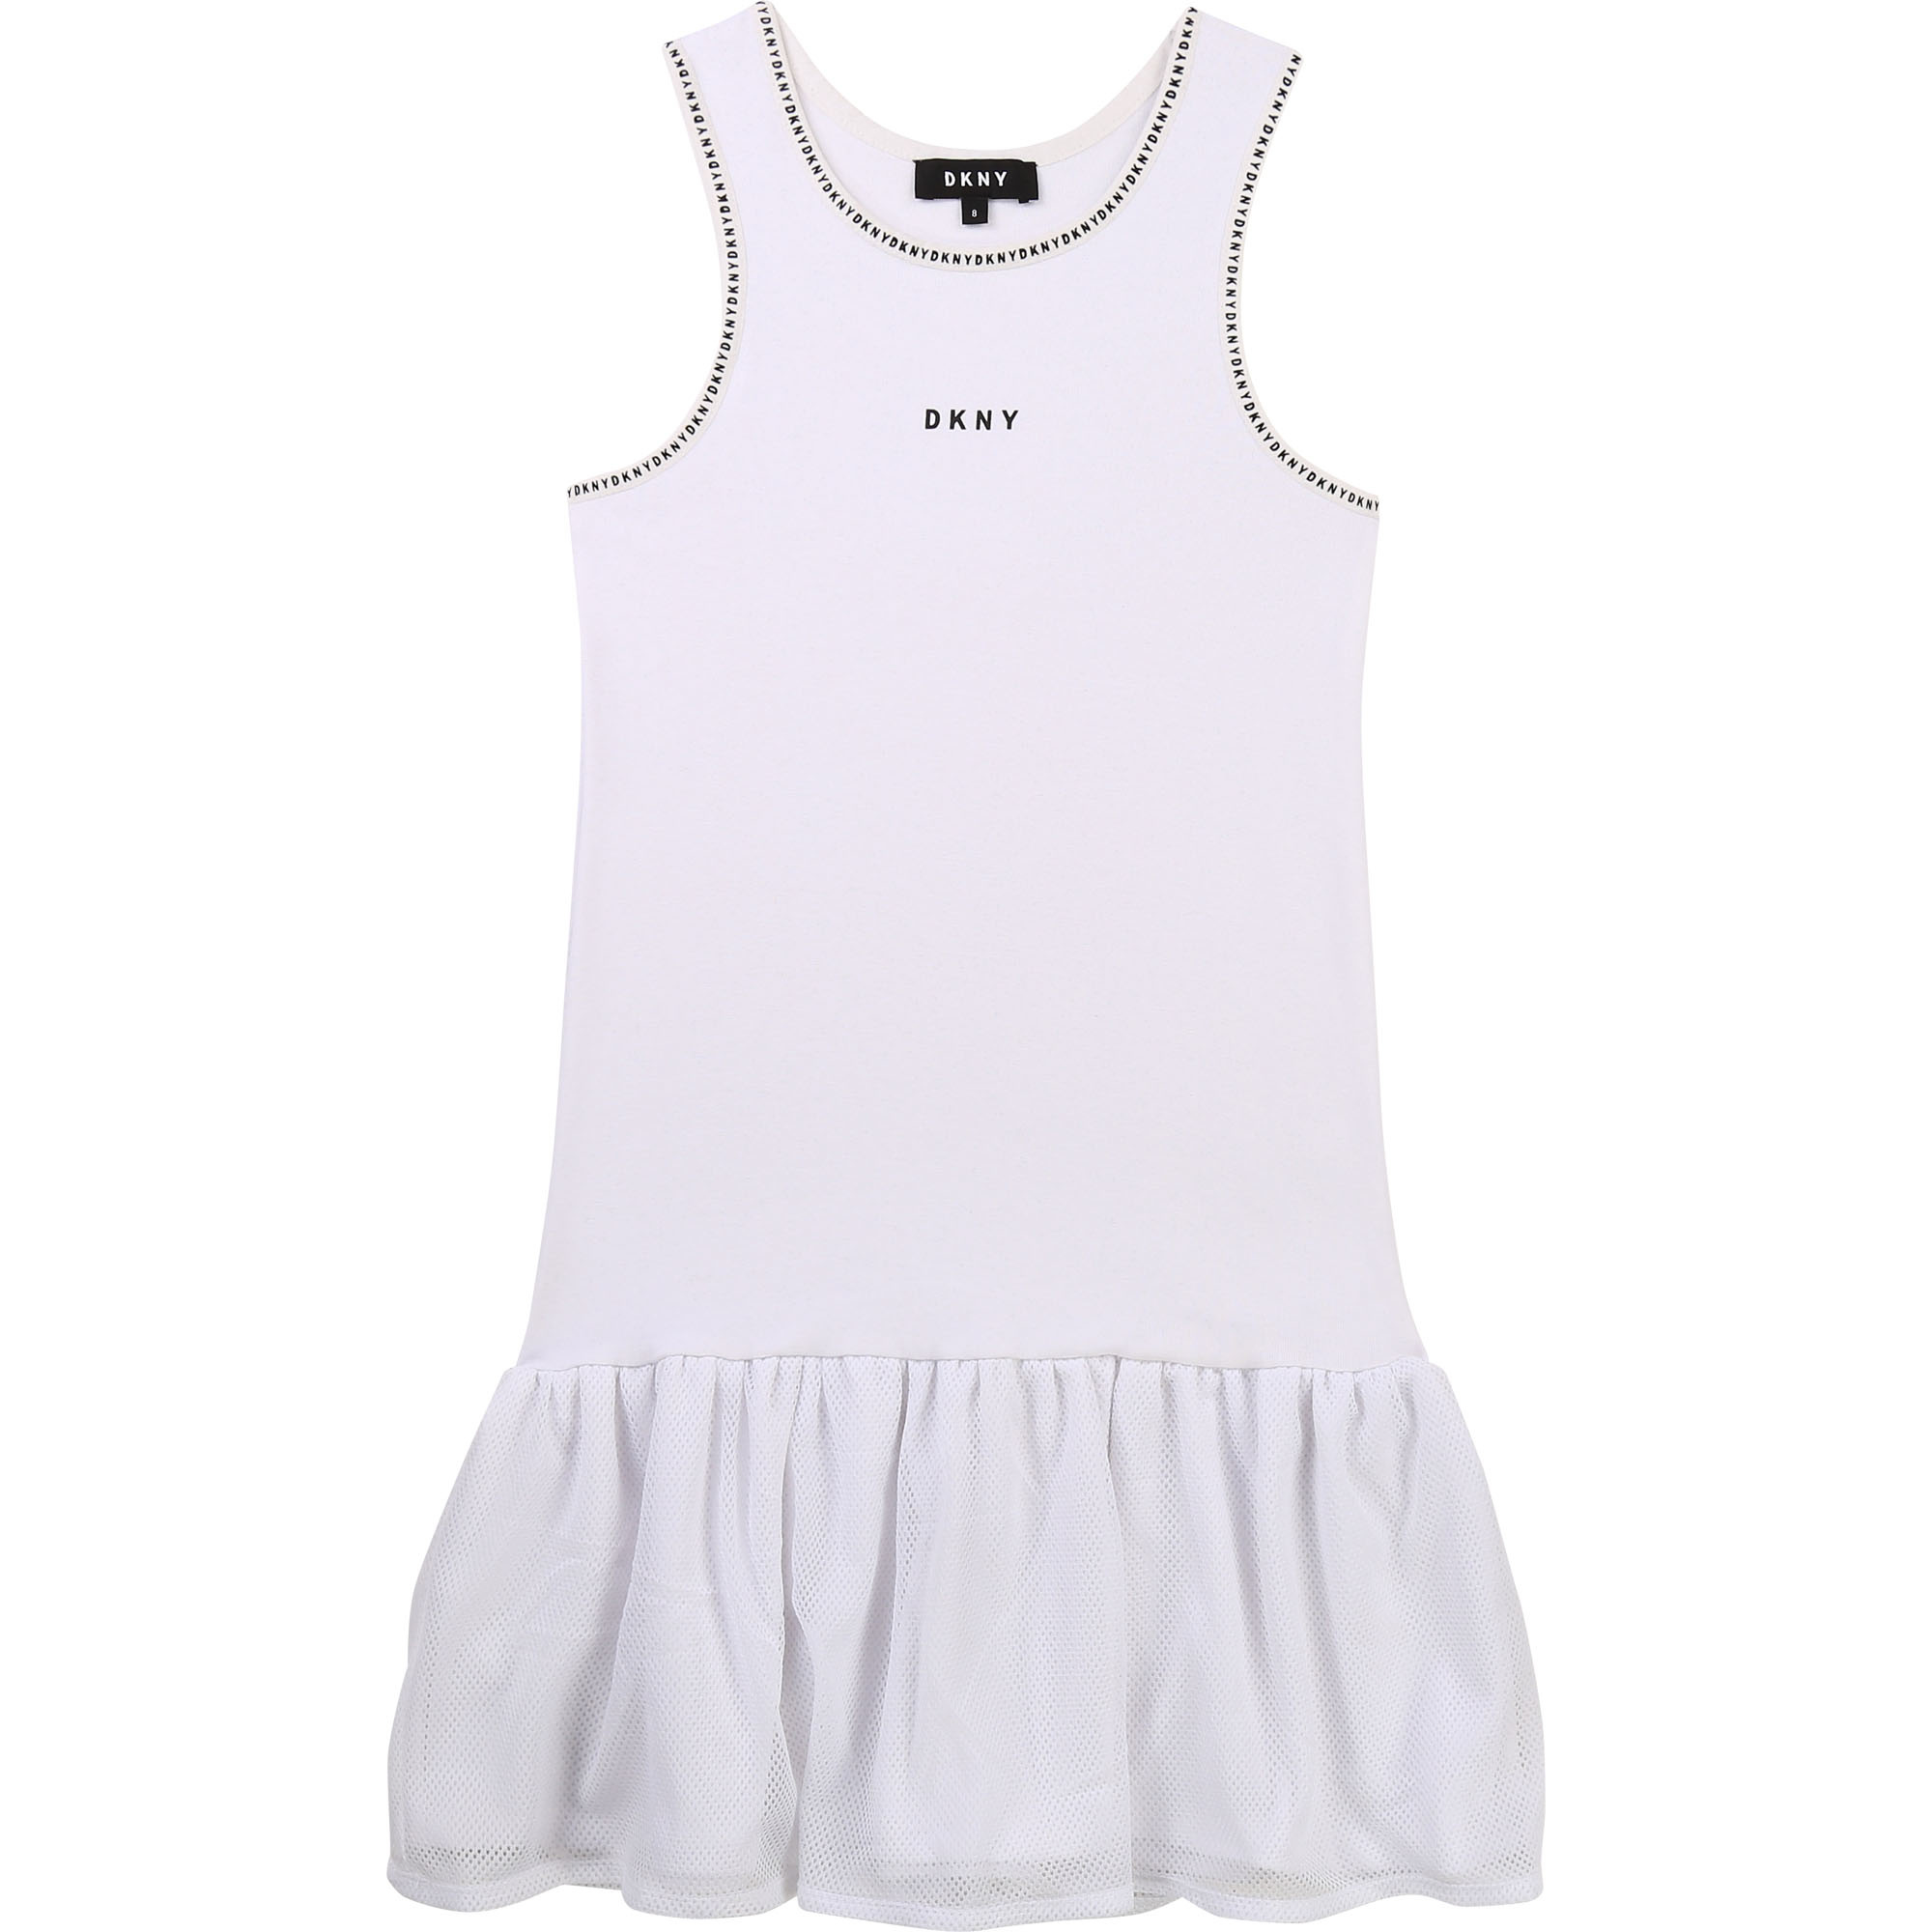 DKNY robe 2 en 1 avec patch brodé-3